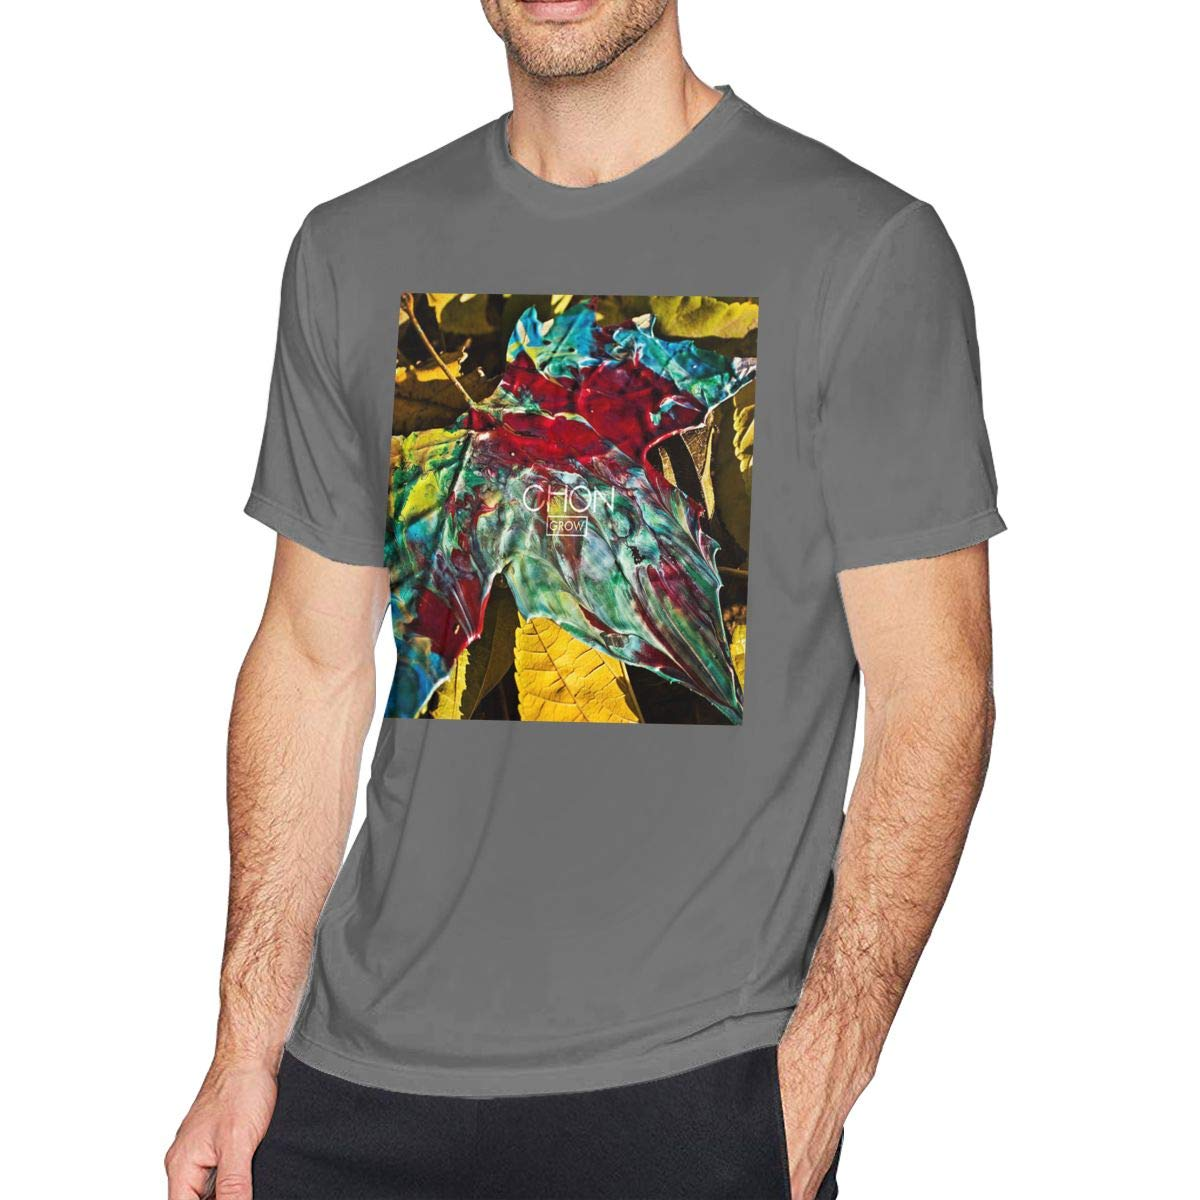 UP-ARP Mens CHON-Waterslide Tee T-Shirt Black